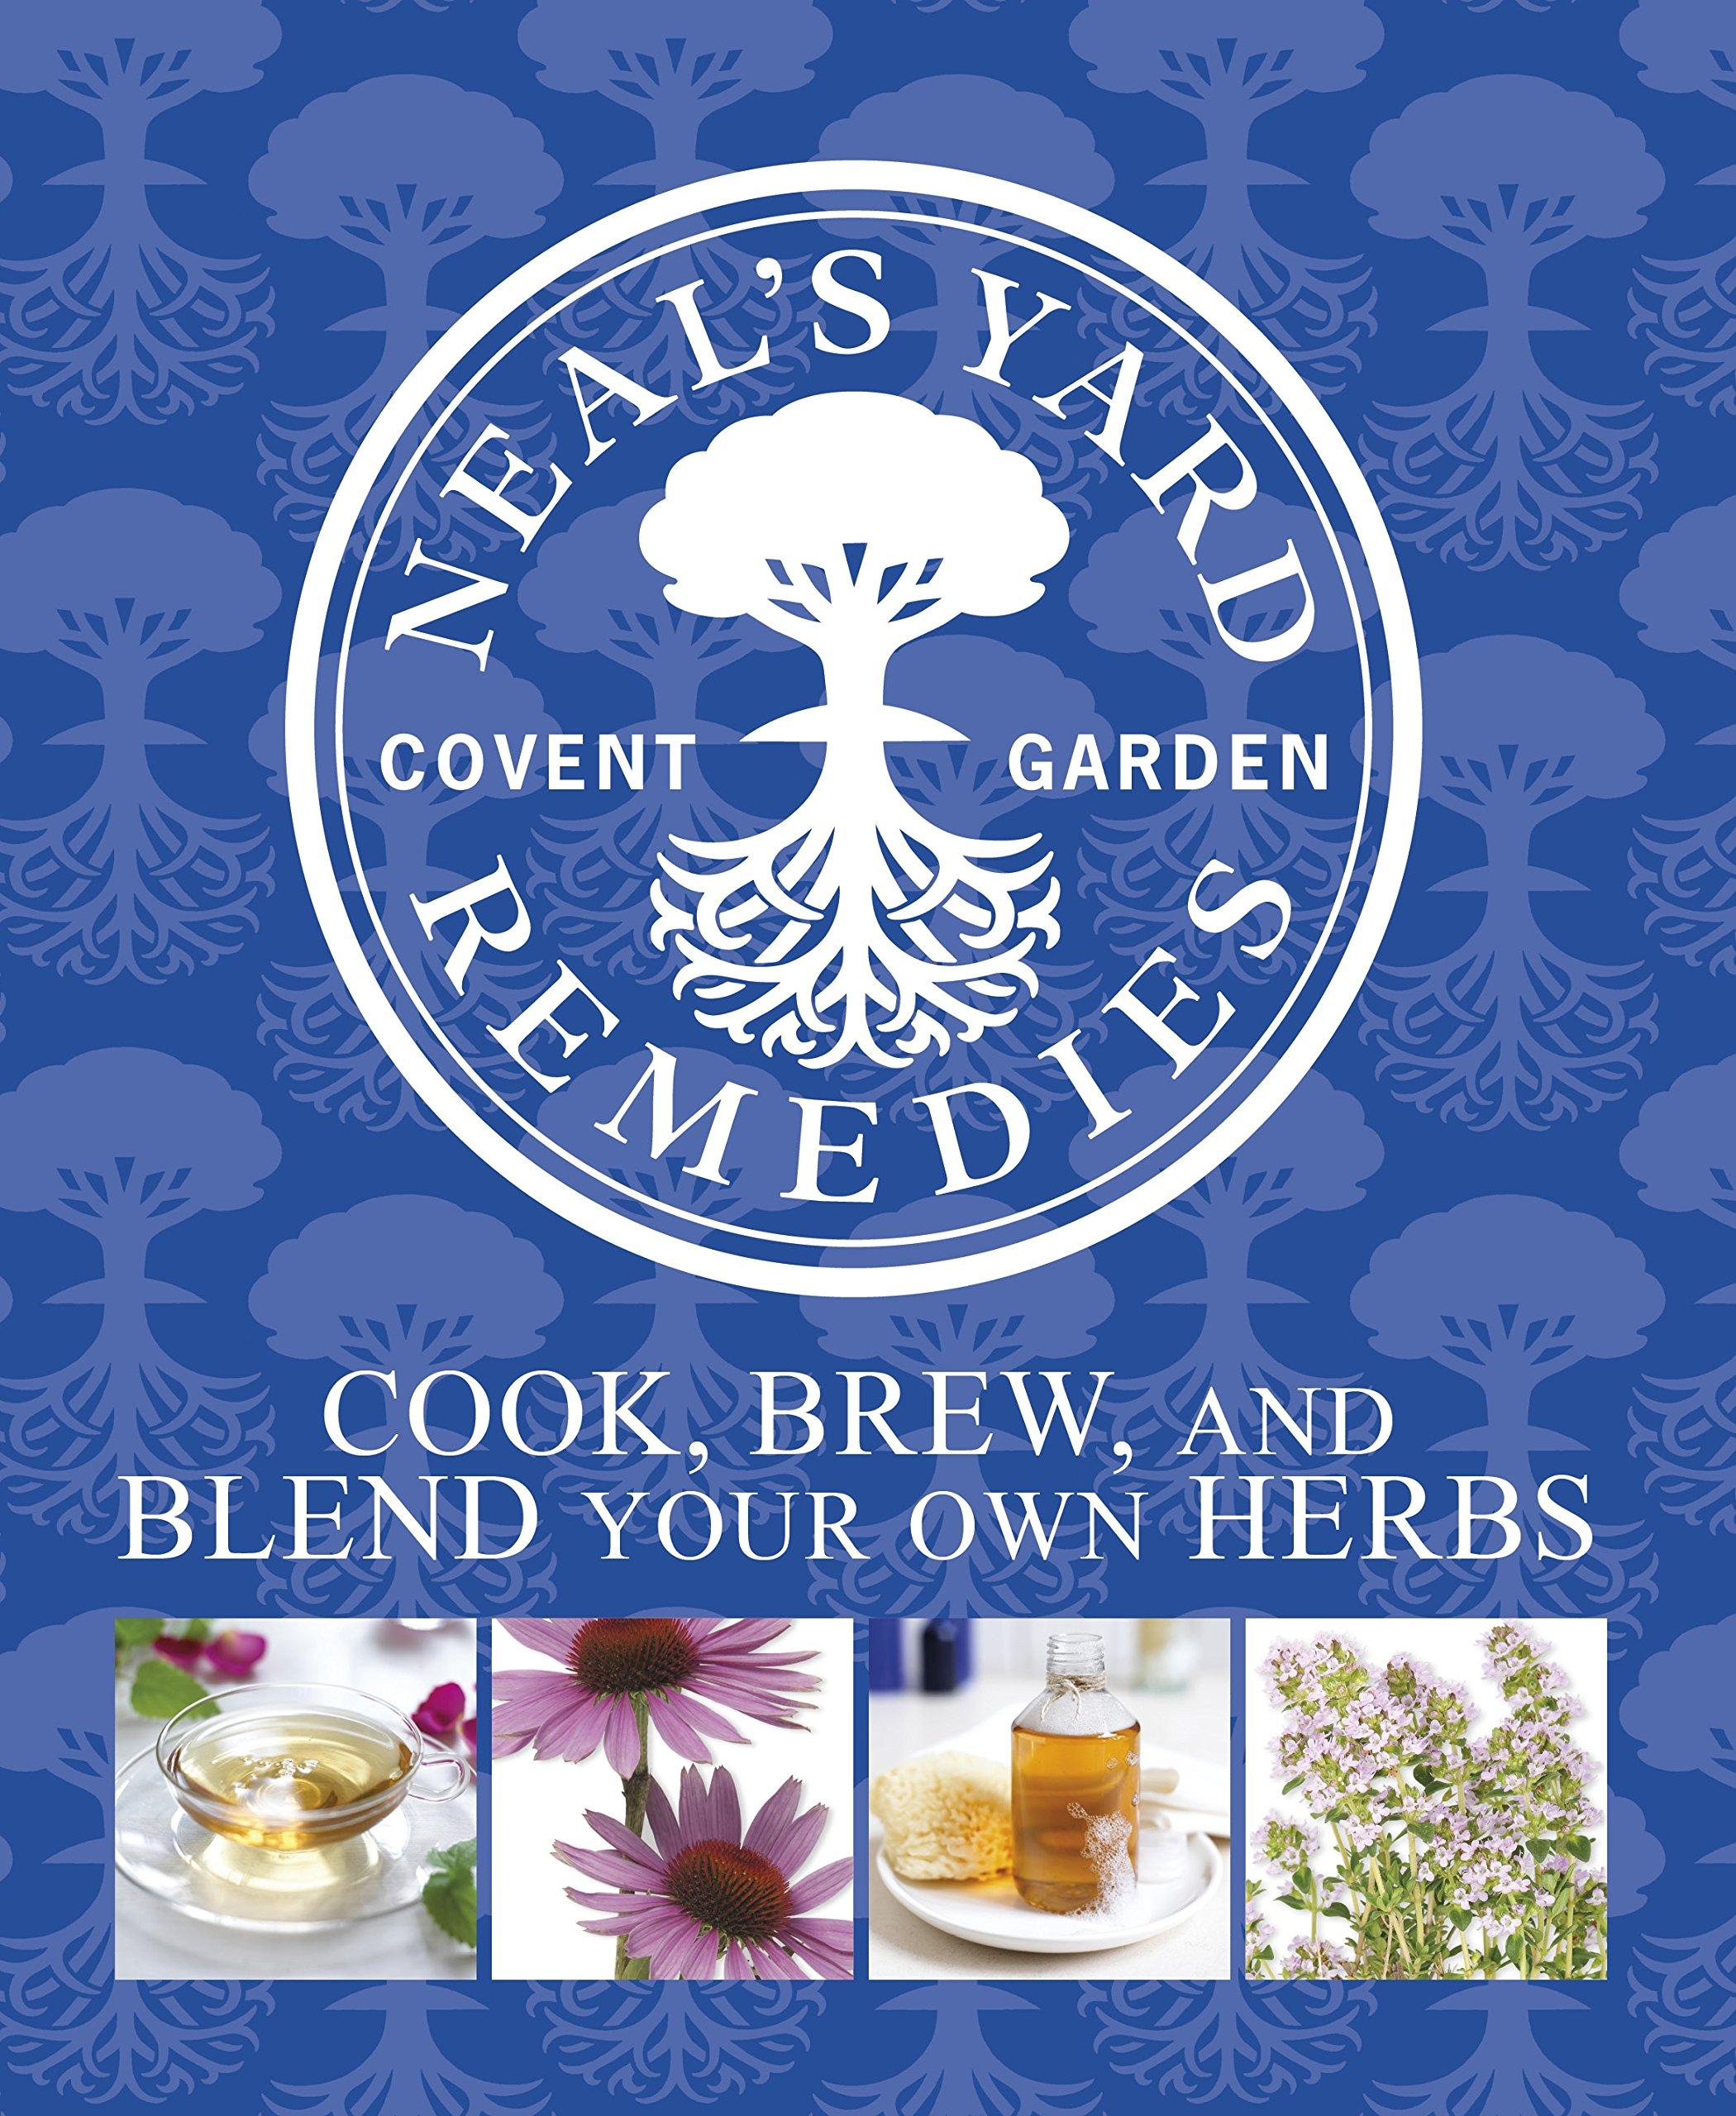 Neals Yard Remedies Blend Herbs